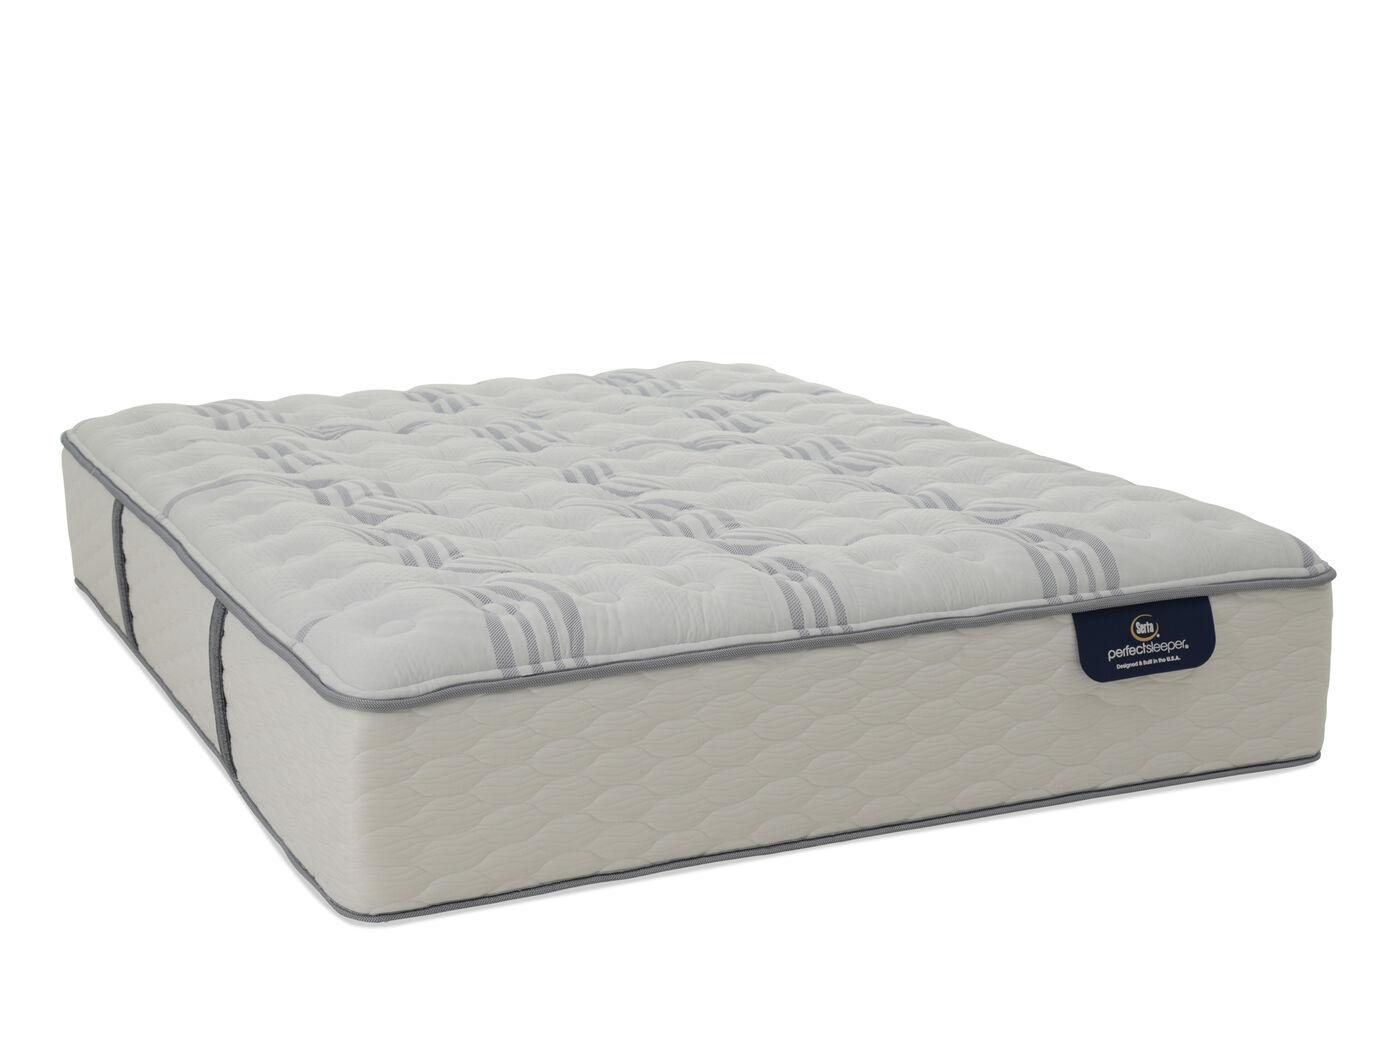 serta mattress perfect sleeper. Simple Mattress Serta Perfect Sleeper Ramsdell Twin Firm Mattress With